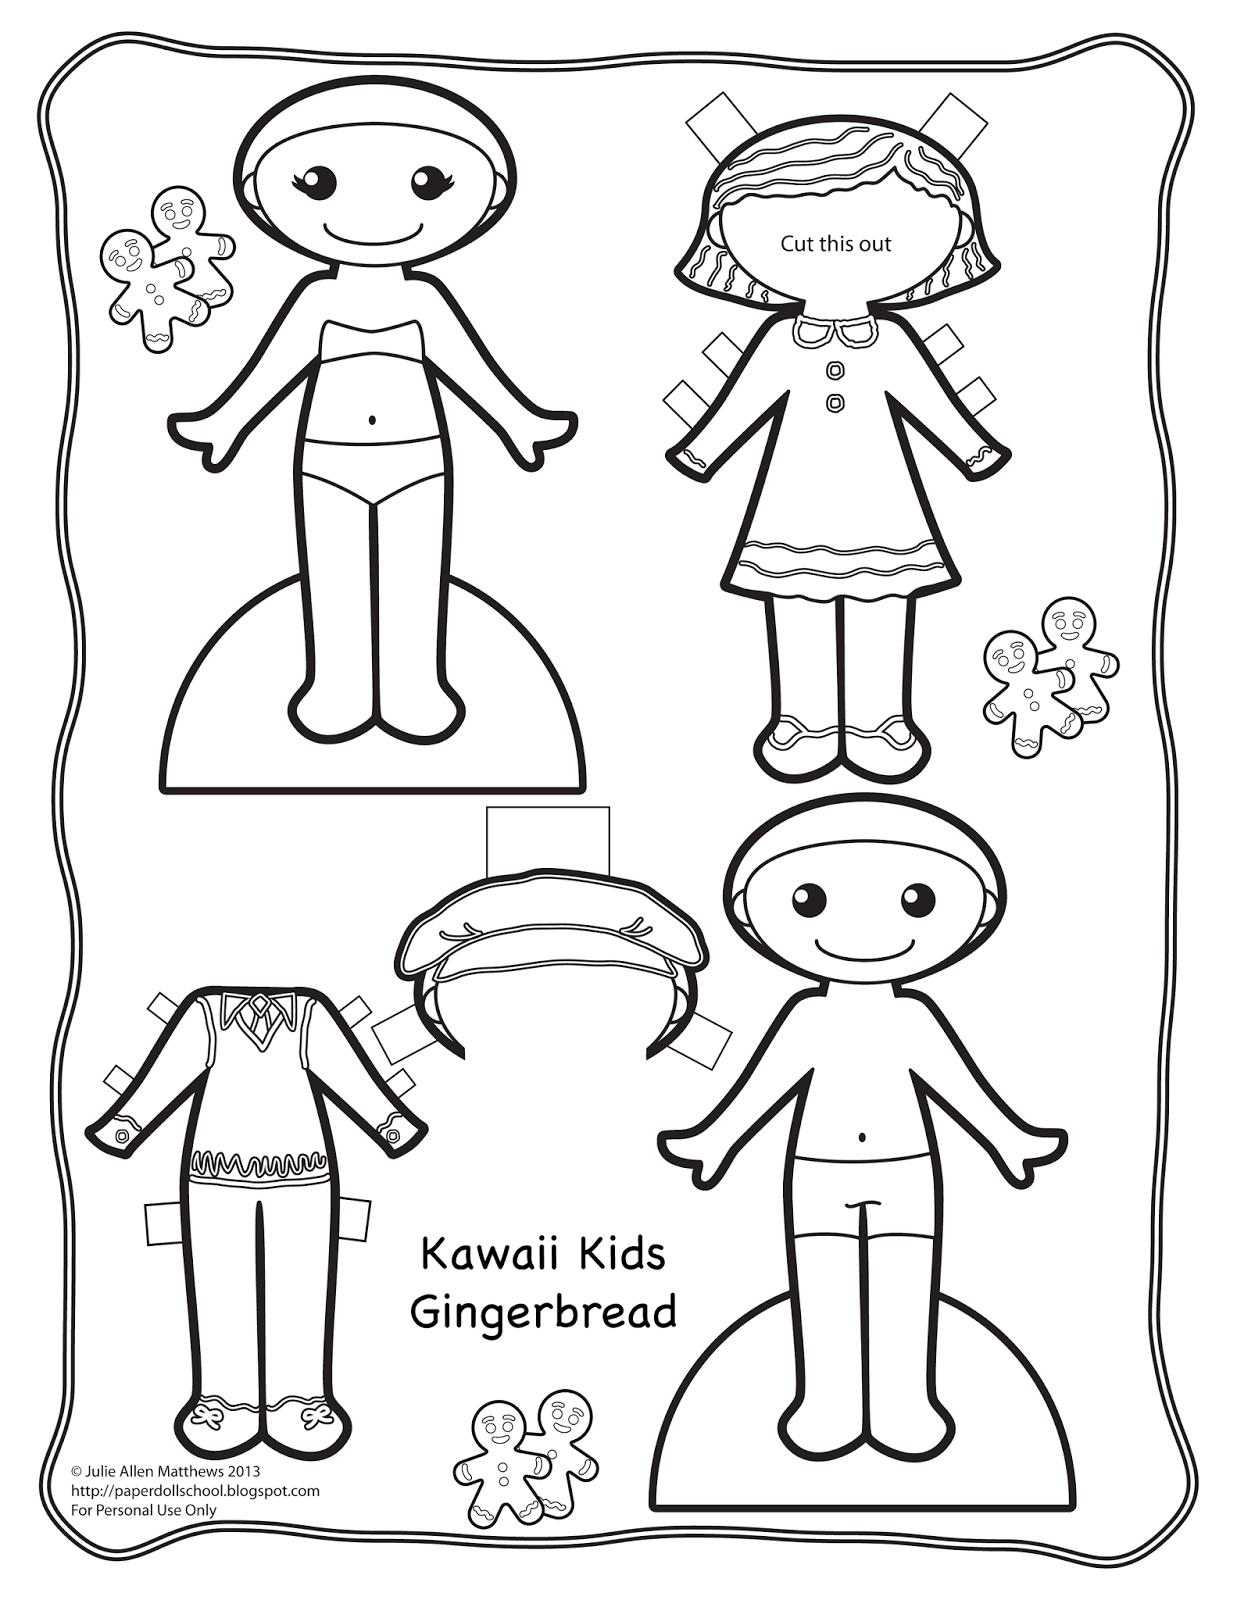 kawaii kids doll 1 gingerbread - Drawing Paper For Kids